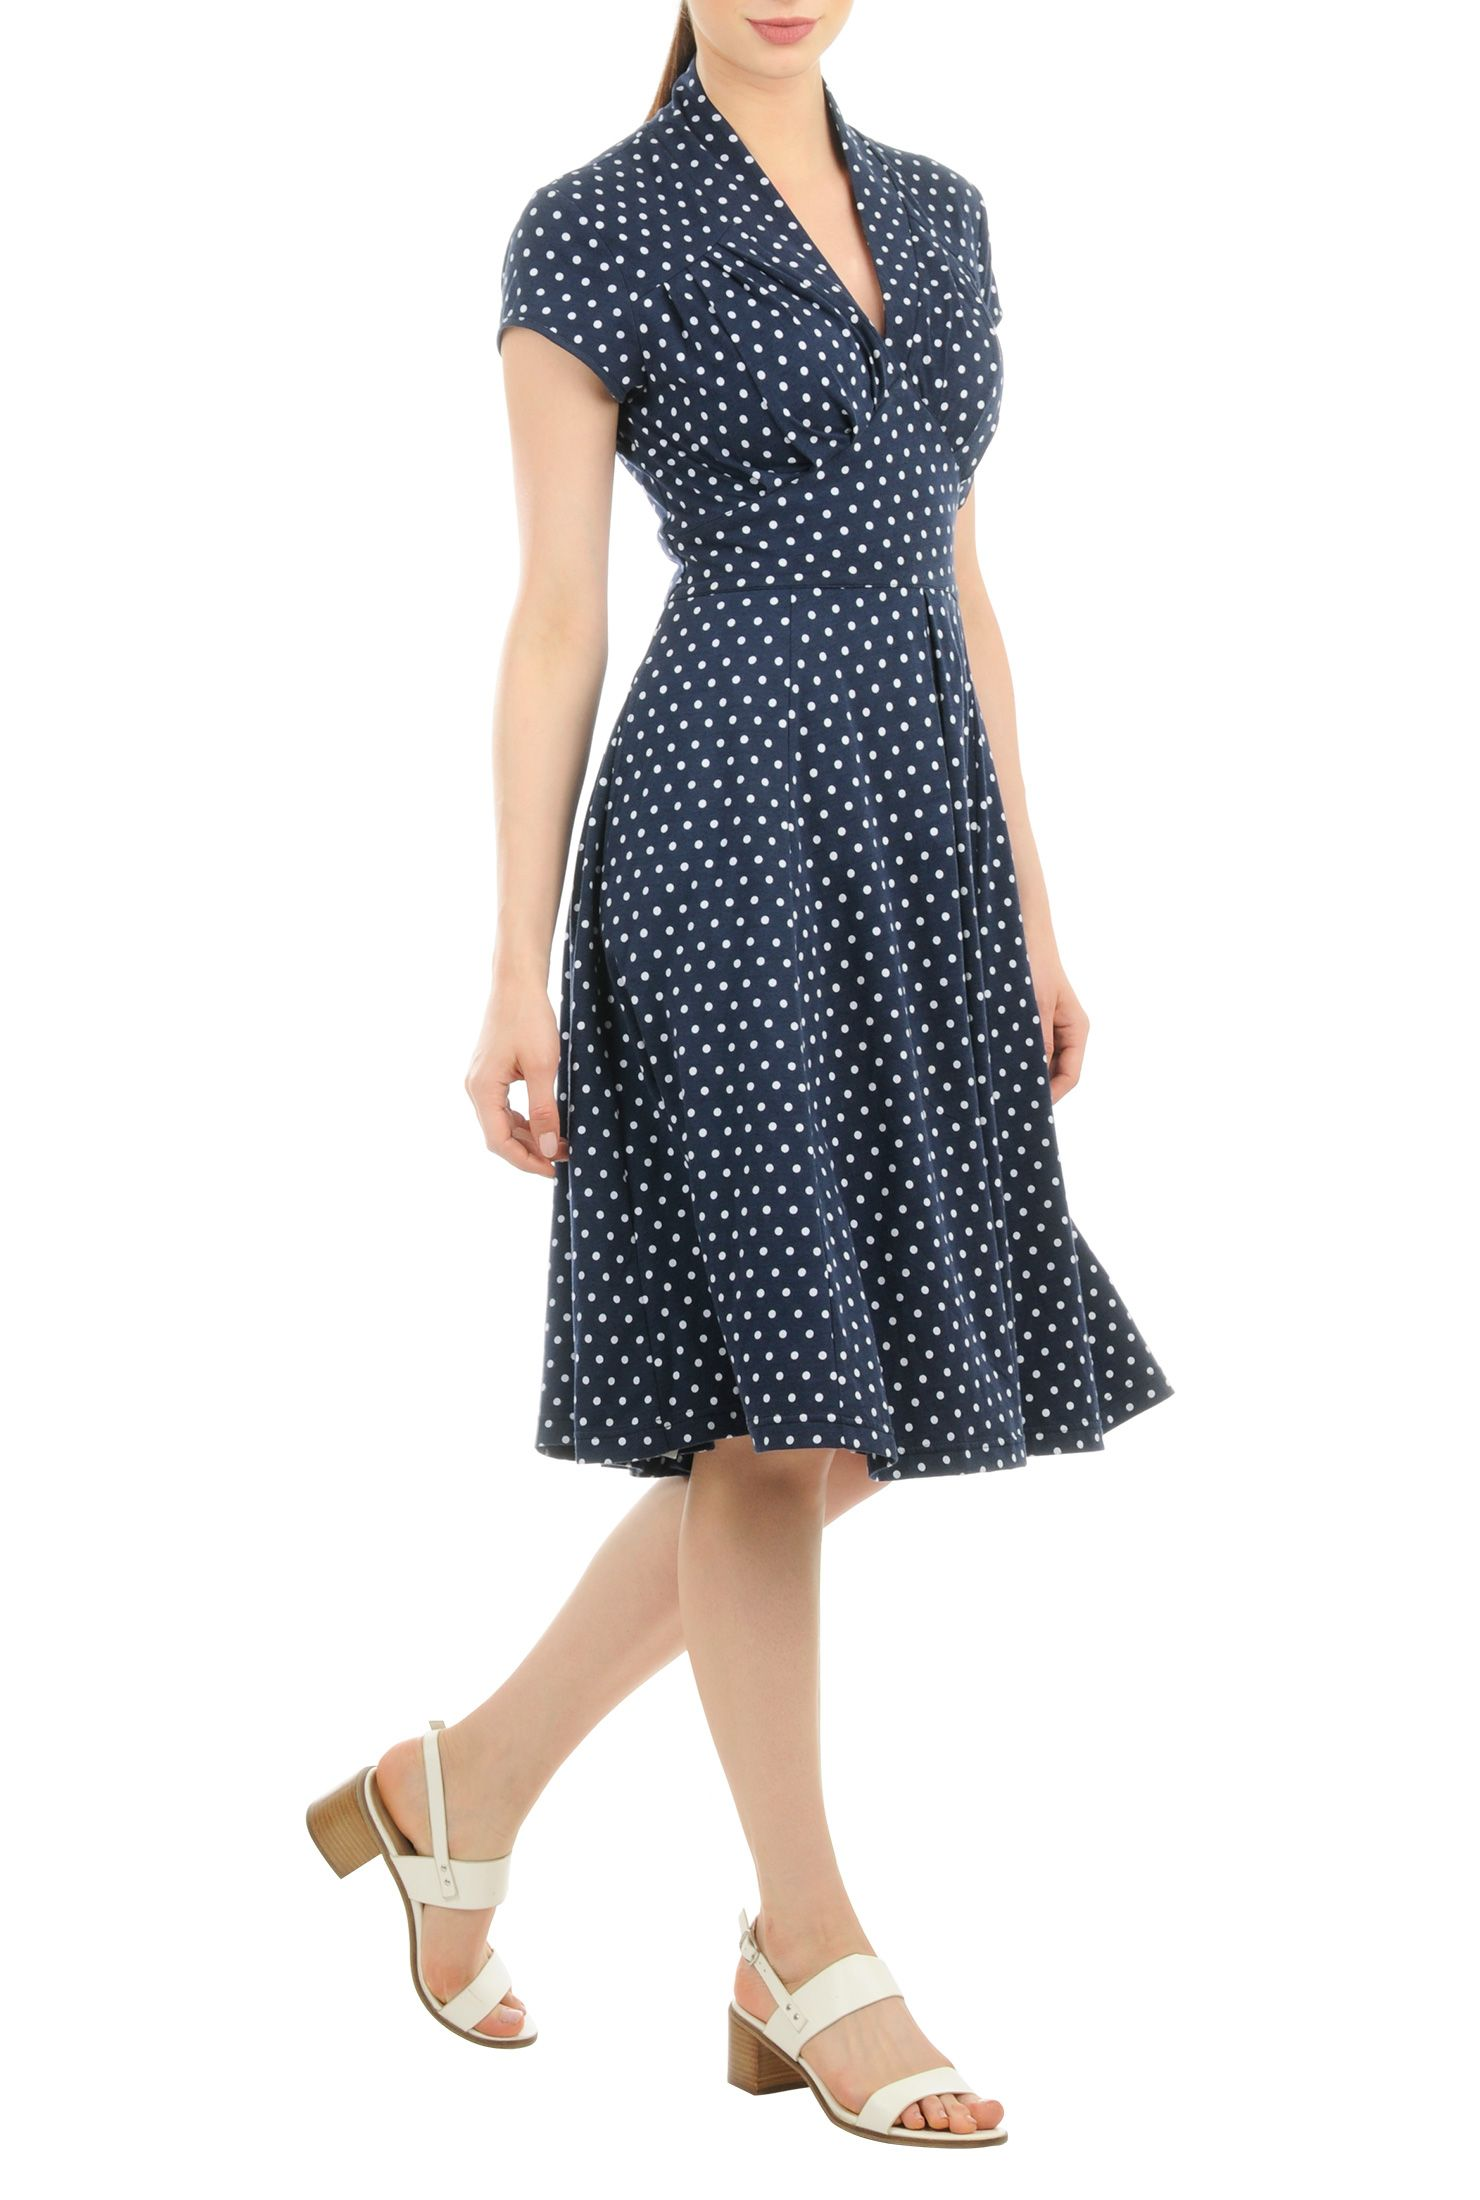 Jersey Knit Dresses for Women